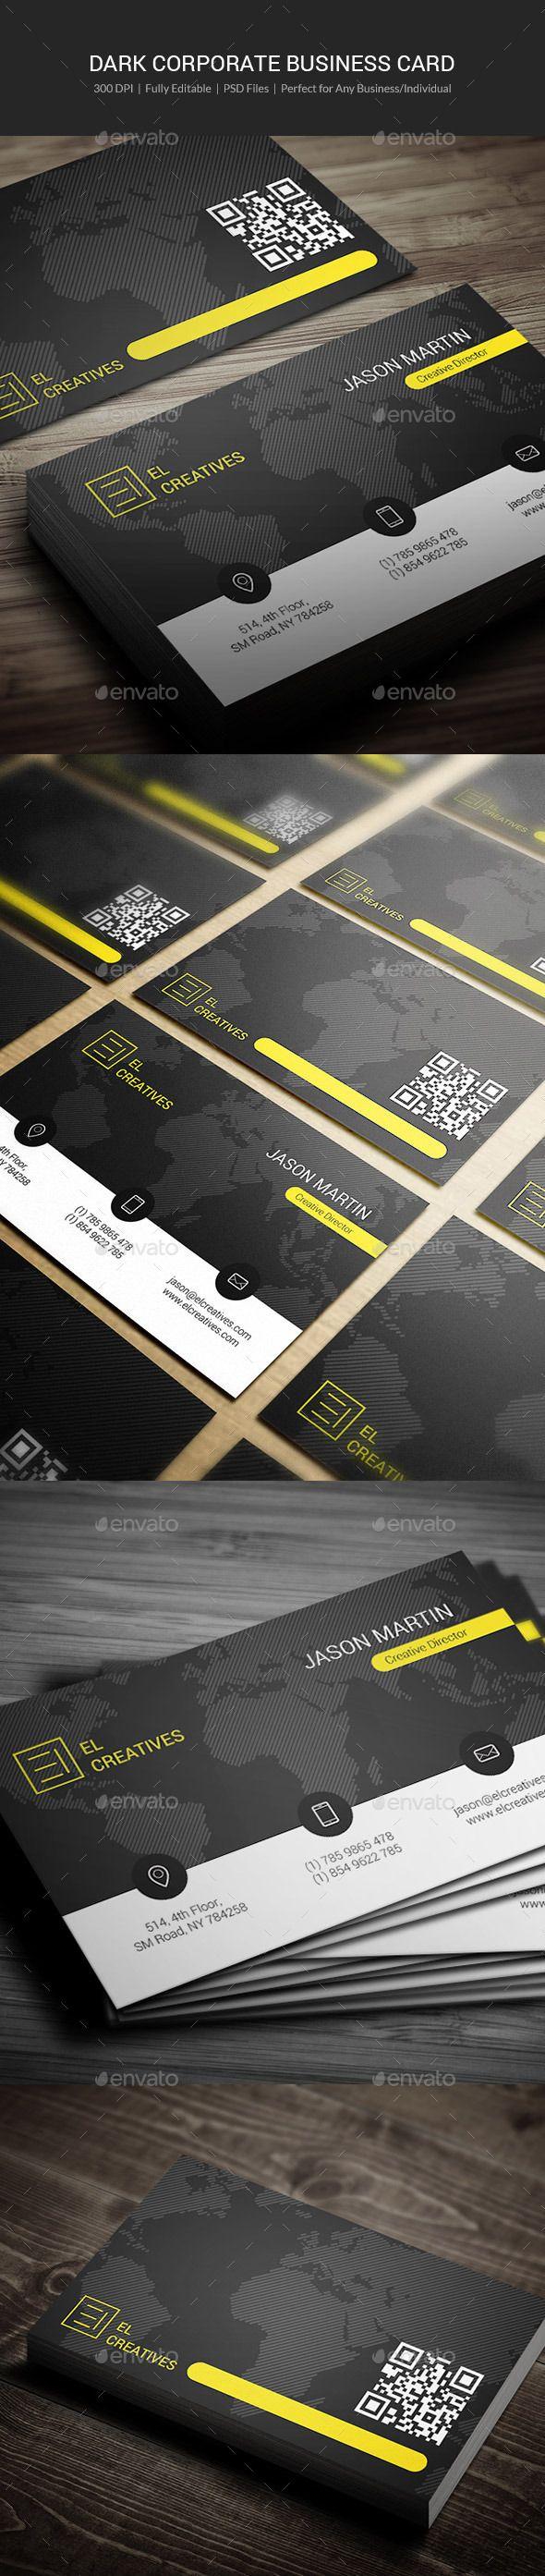 Dark Corporate Business Card Template #design Download: http://graphicriver.net/item/dark-corporate-business-card-05/11371477?ref=ksioks